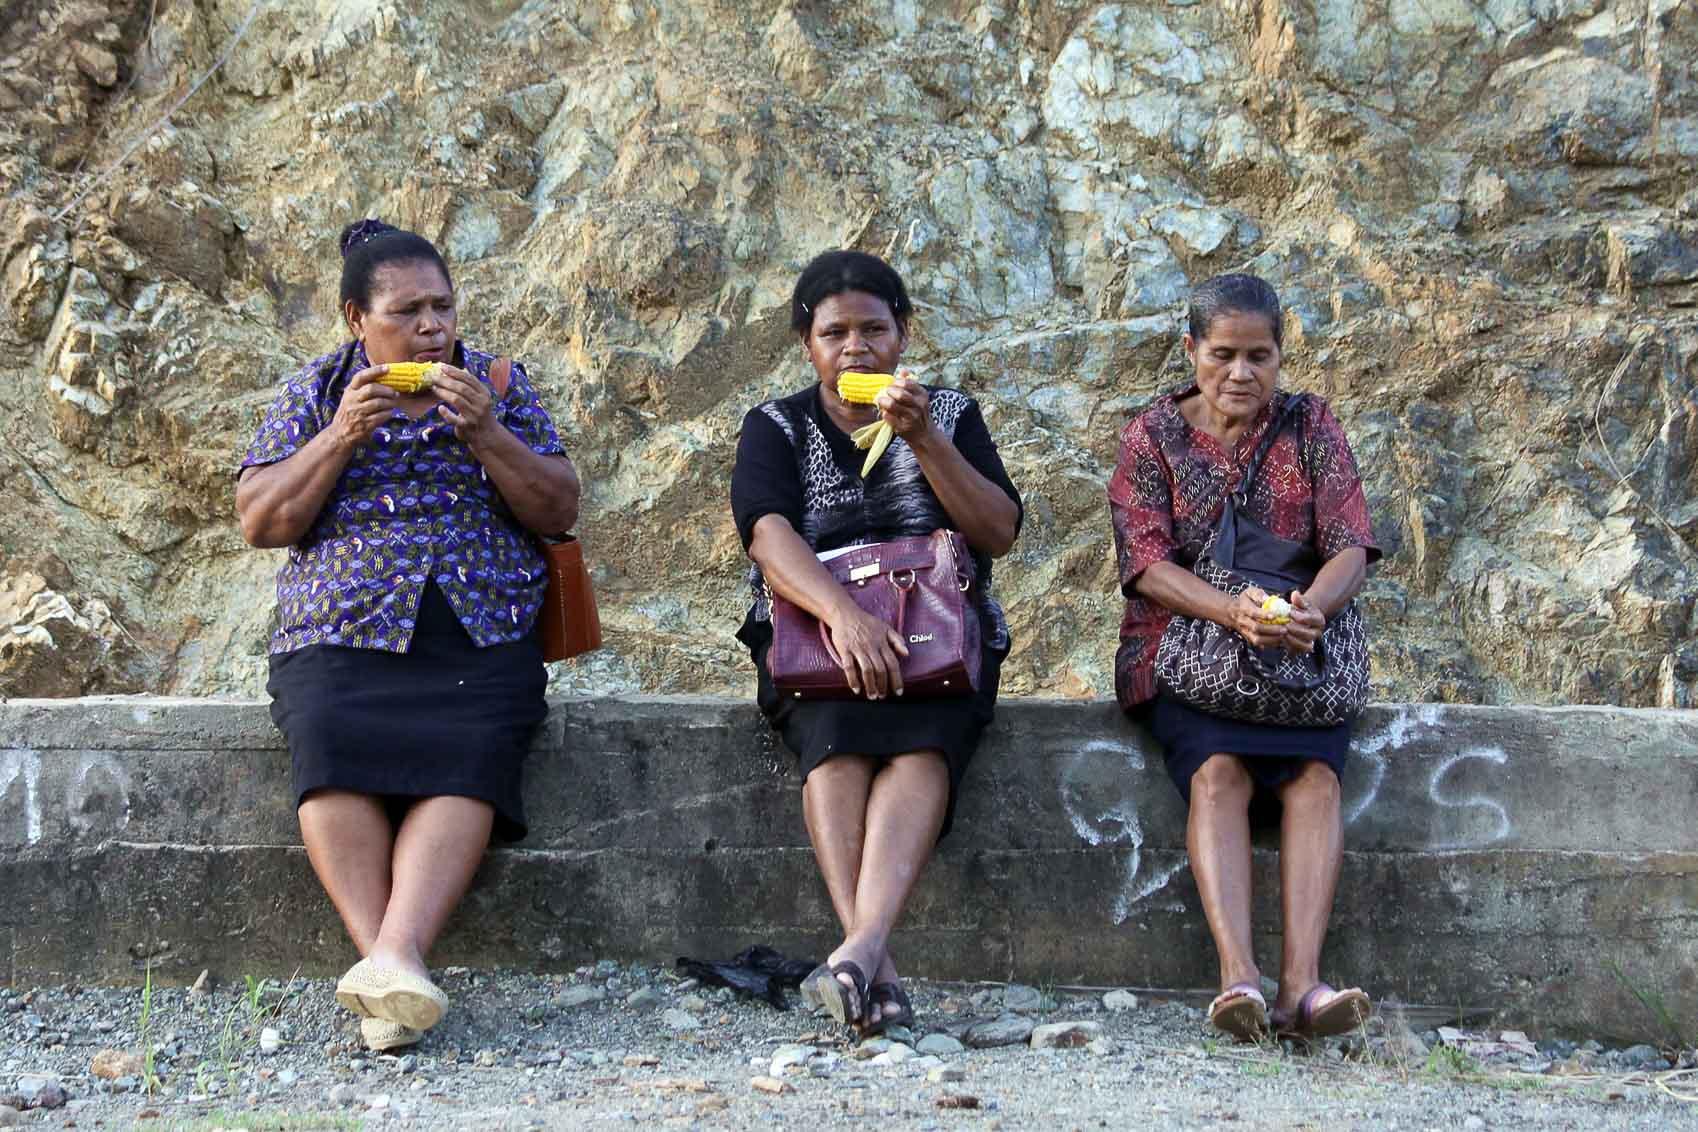 3 damen vom straßenrand